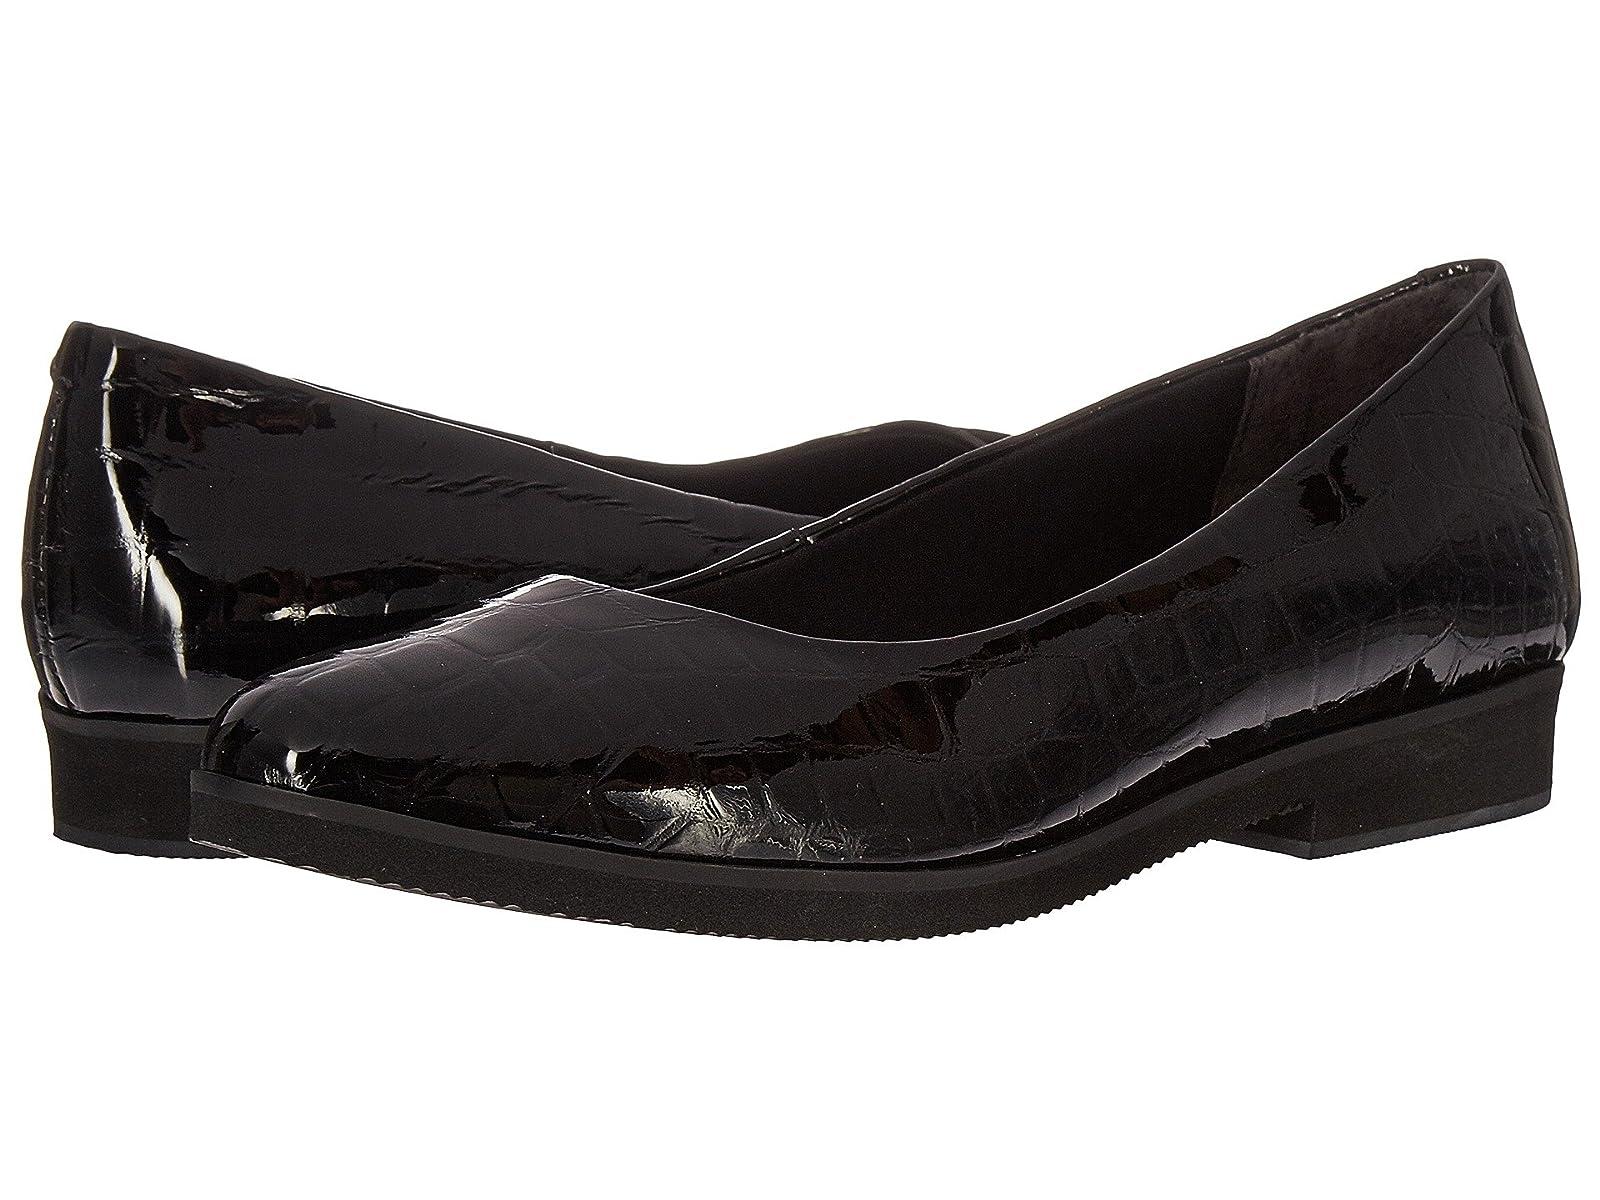 Walking Cradles BounceCheap and distinctive eye-catching shoes